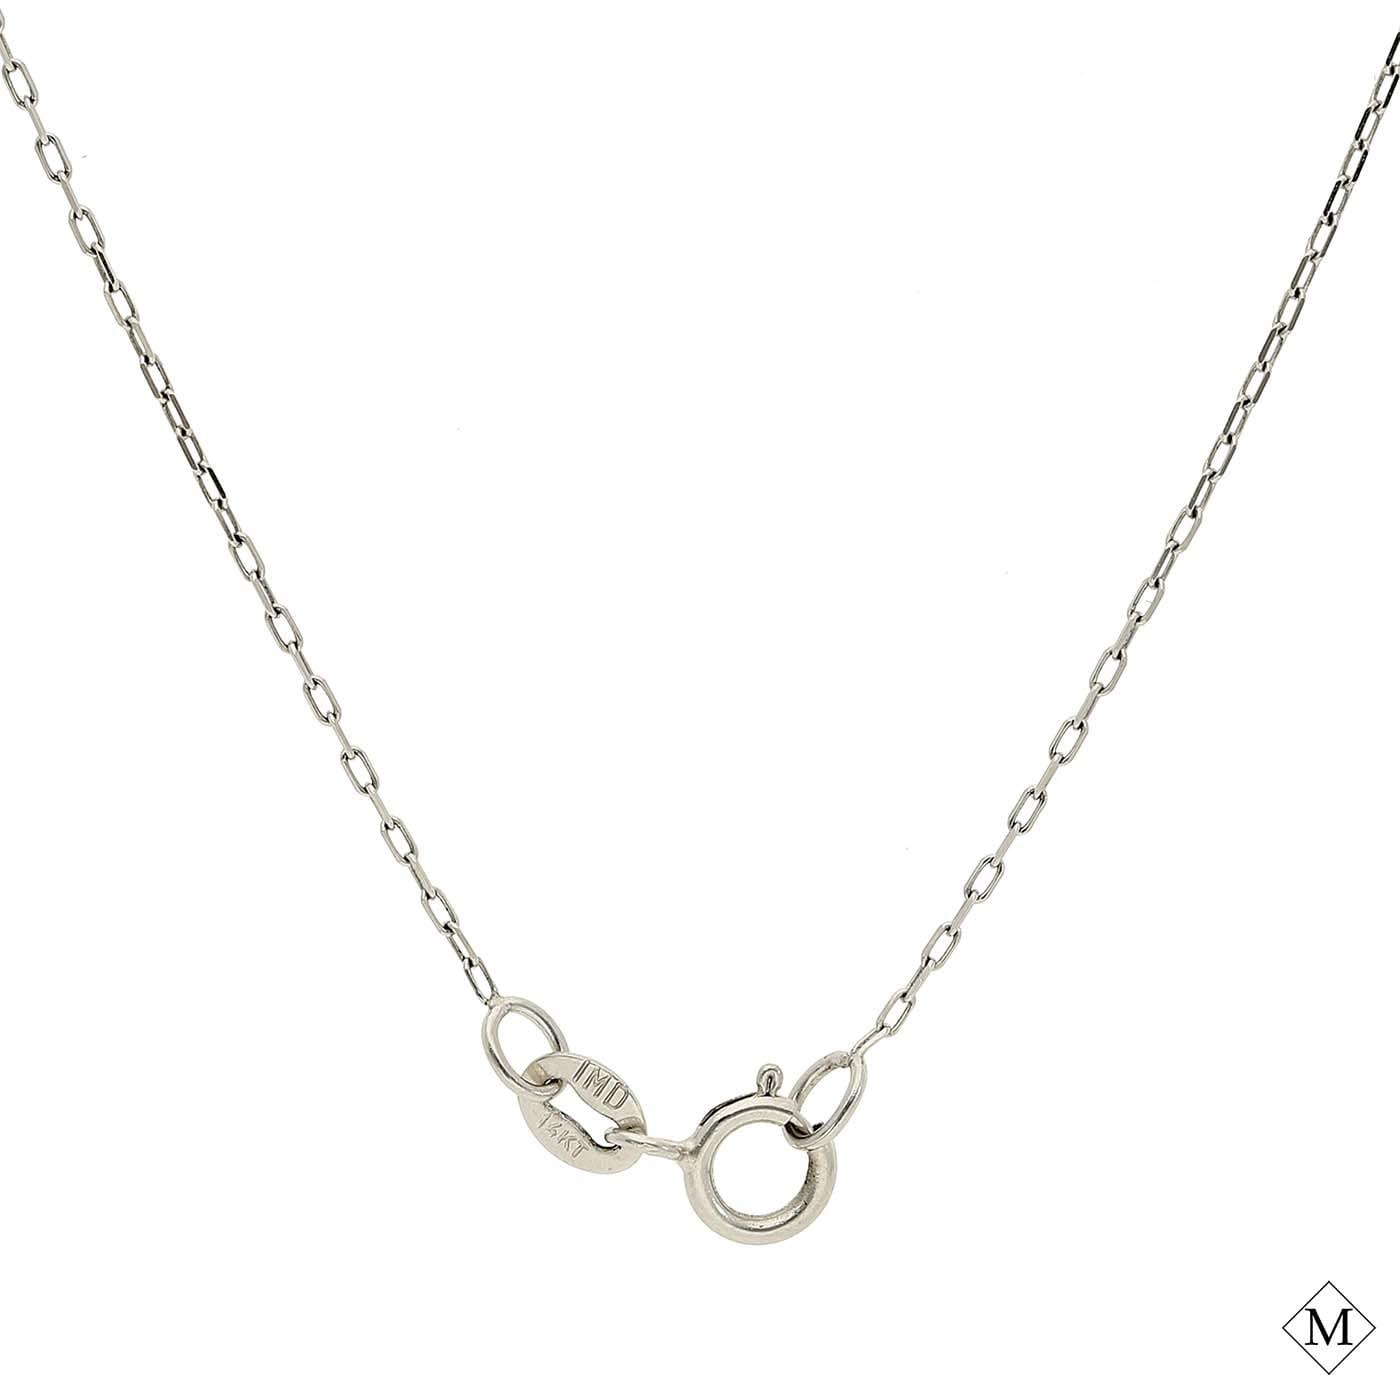 e62dd55c88e8 Classic Blue Diamond PendantStyle #: MDPND9993   Shop Engagement ...